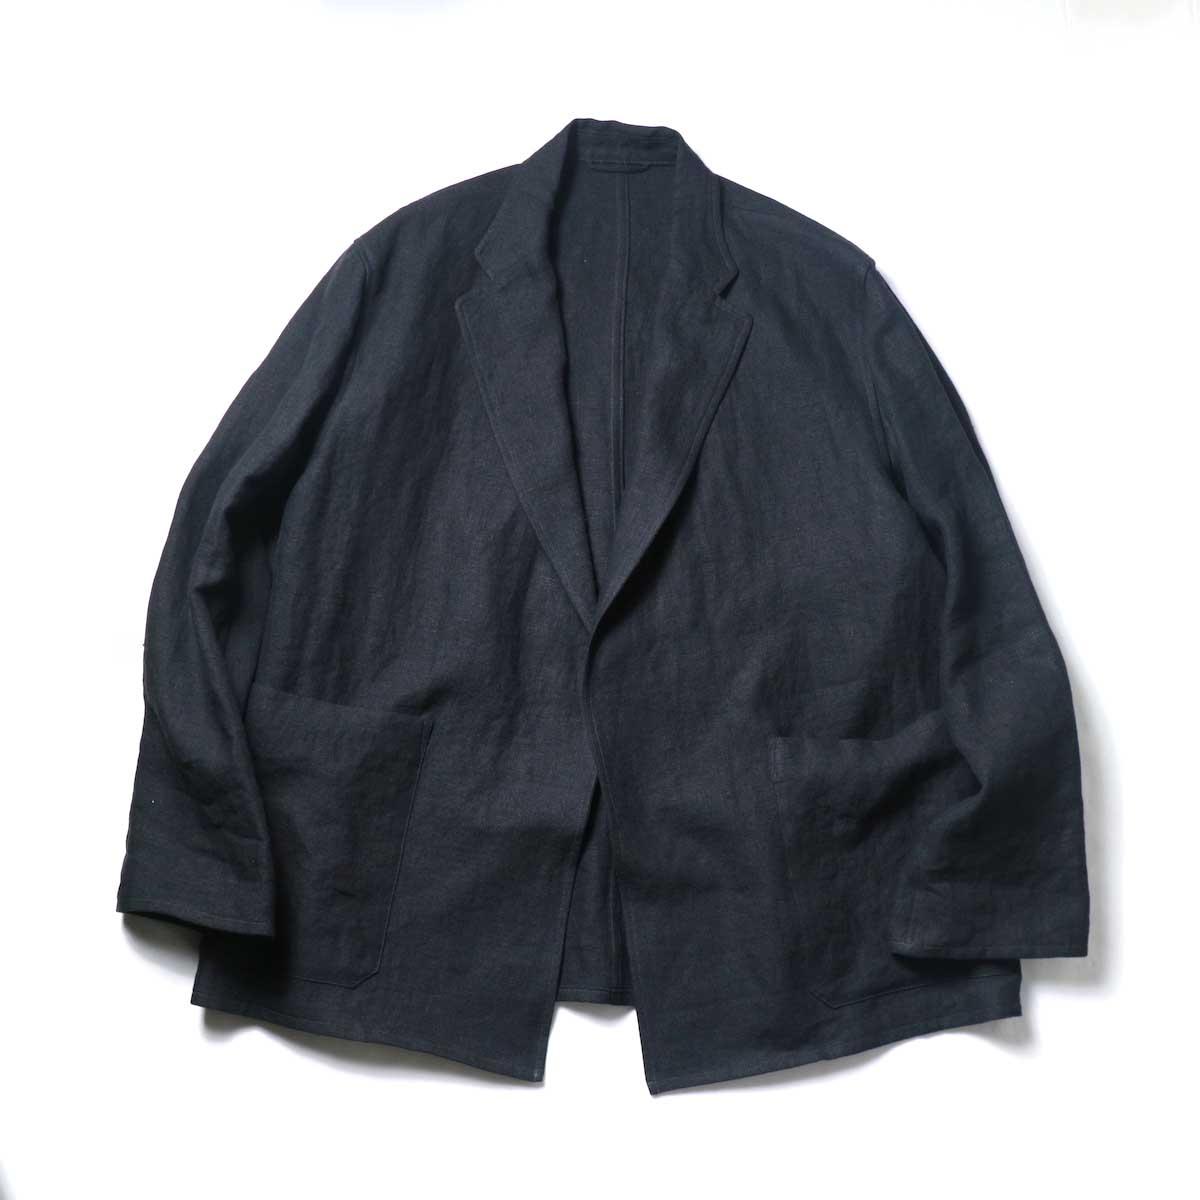 blurhms / Wash Linen Cardigan Jacket (Black)